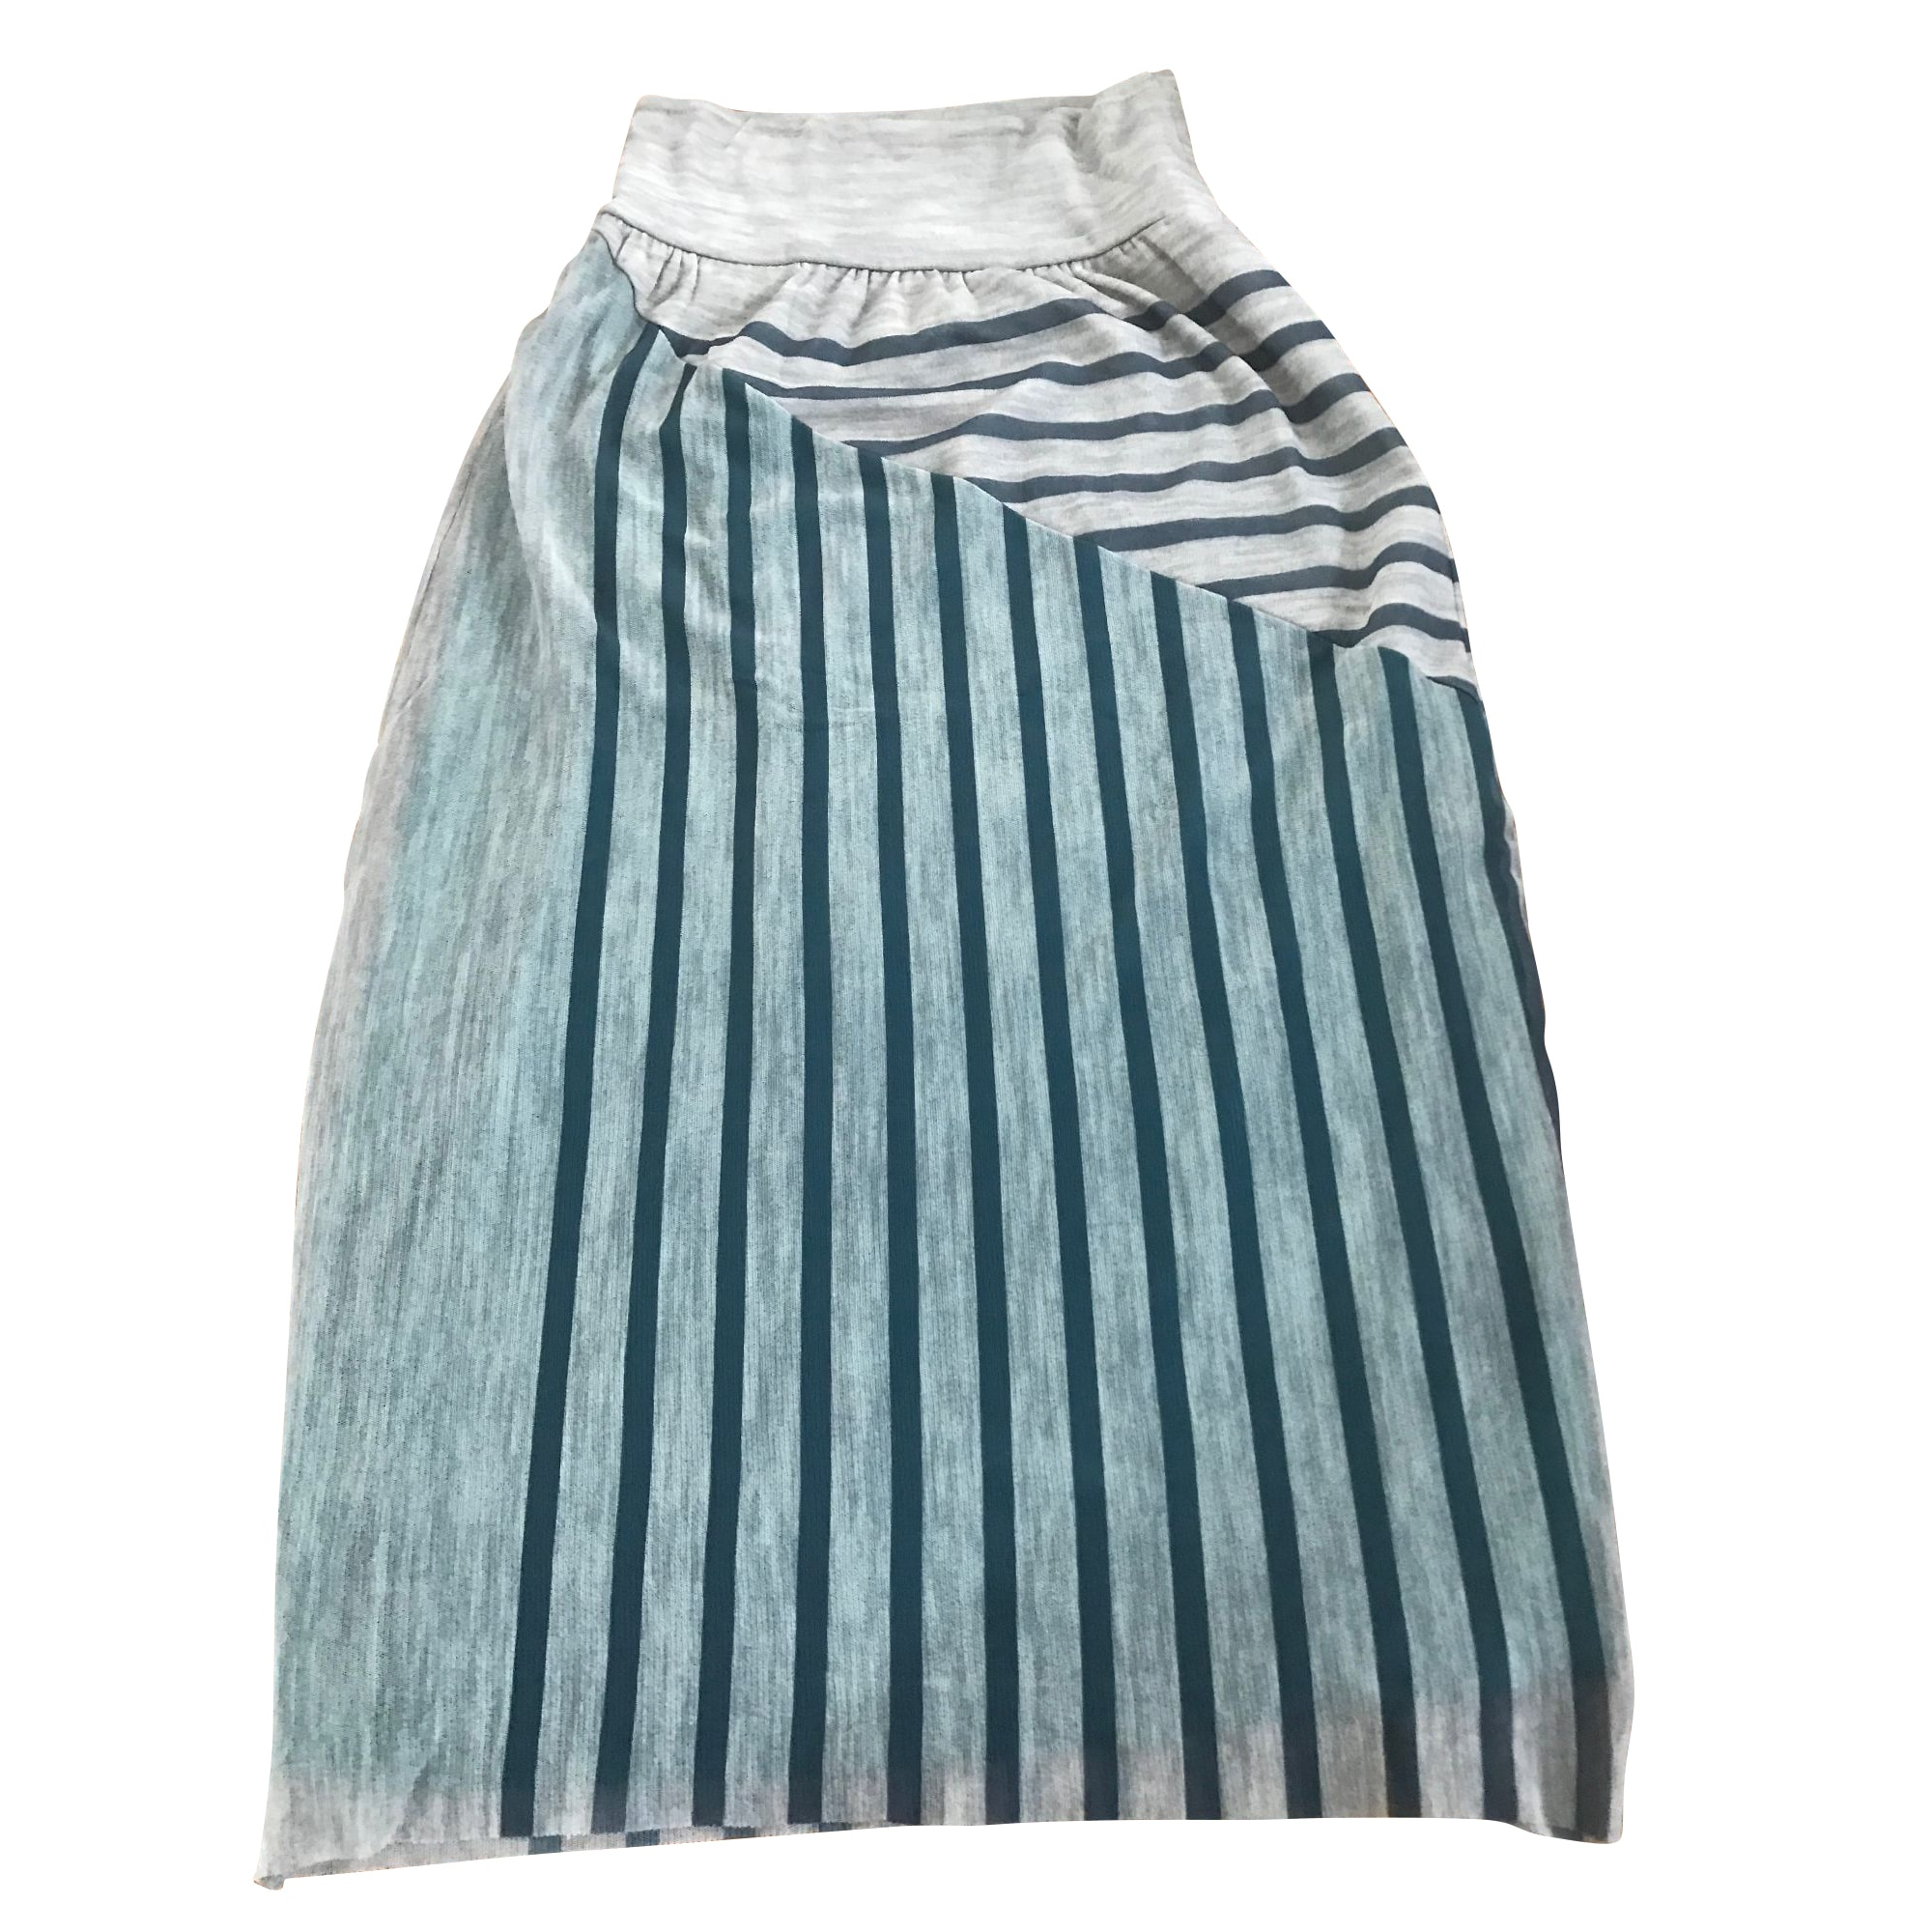 Jupe mi-longue JEAN PAUL GAULTIER Bleu, bleu marine, bleu turquoise